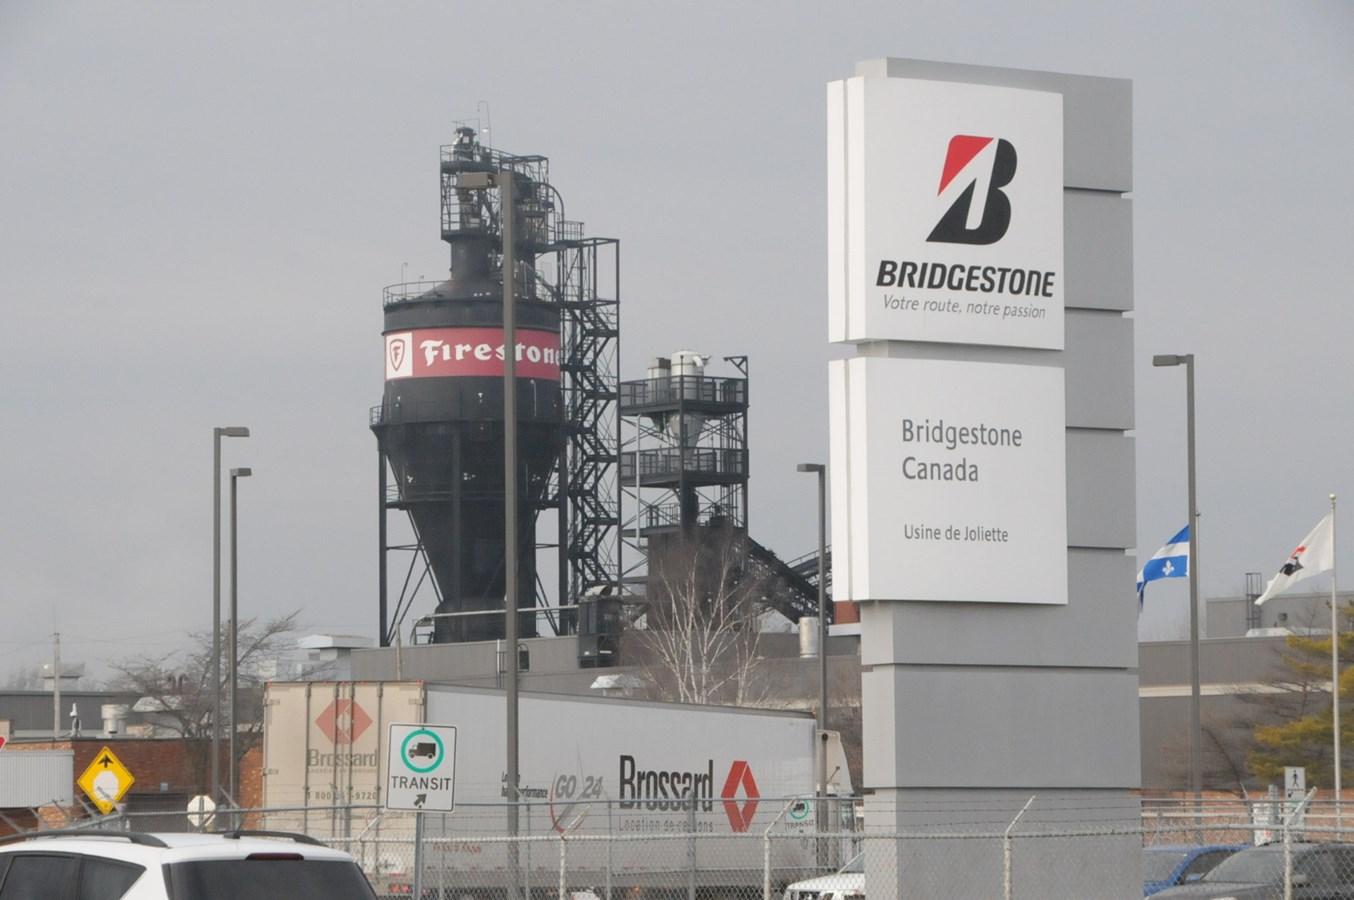 Bridgestone – Projets Lots 1 et 2